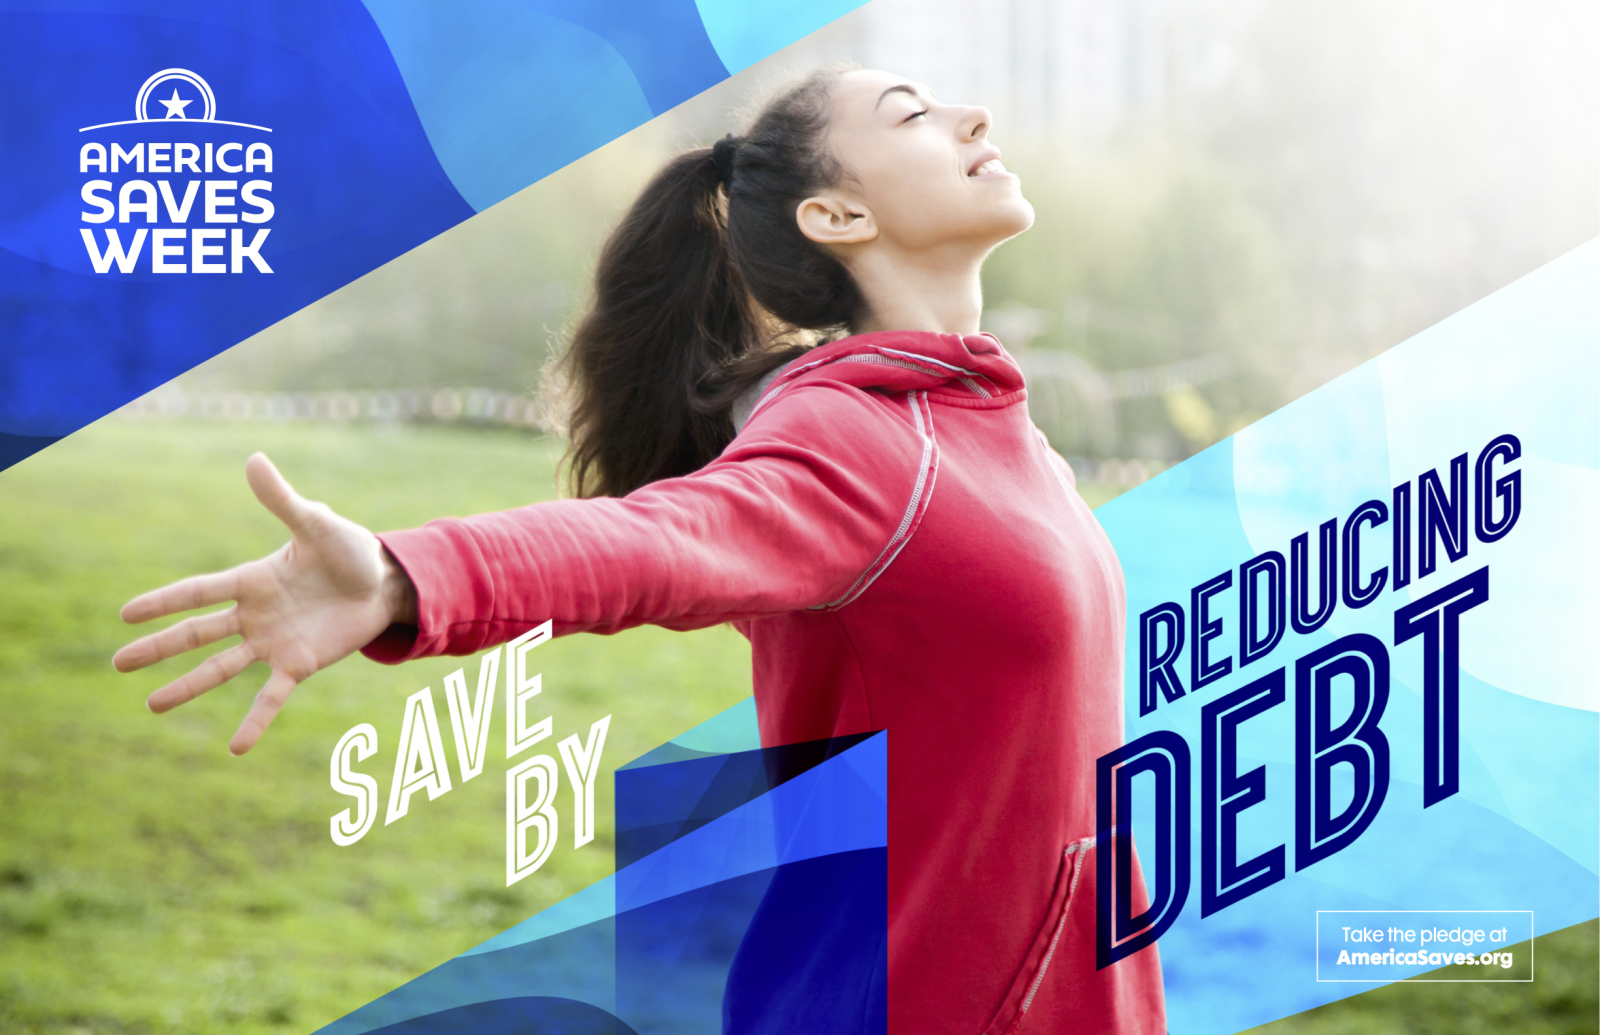 Save by Reducing Your Debt - America Saves Week 2021